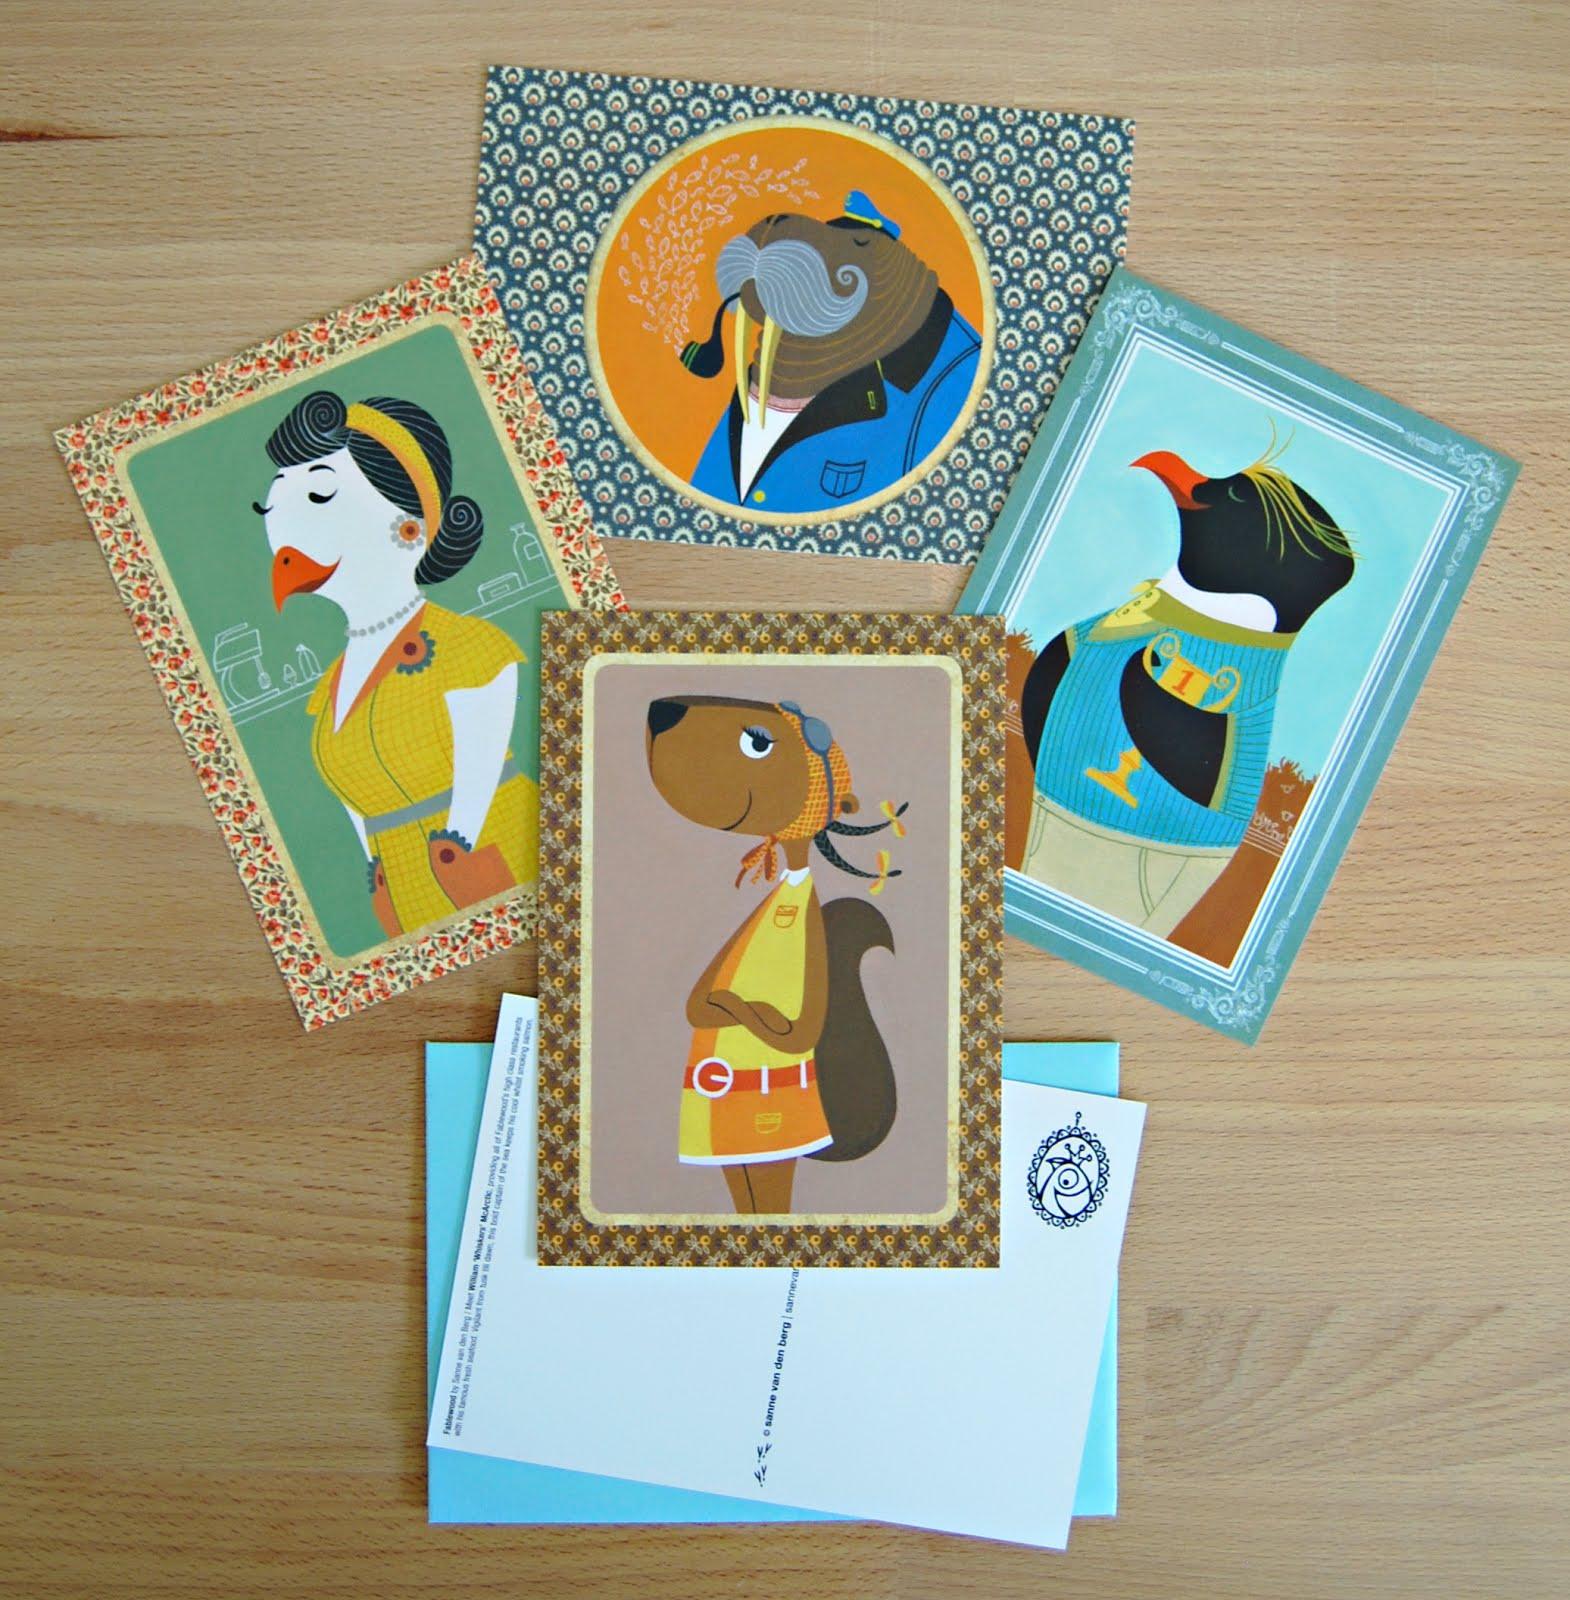 FABLEWOOD kaartenserie